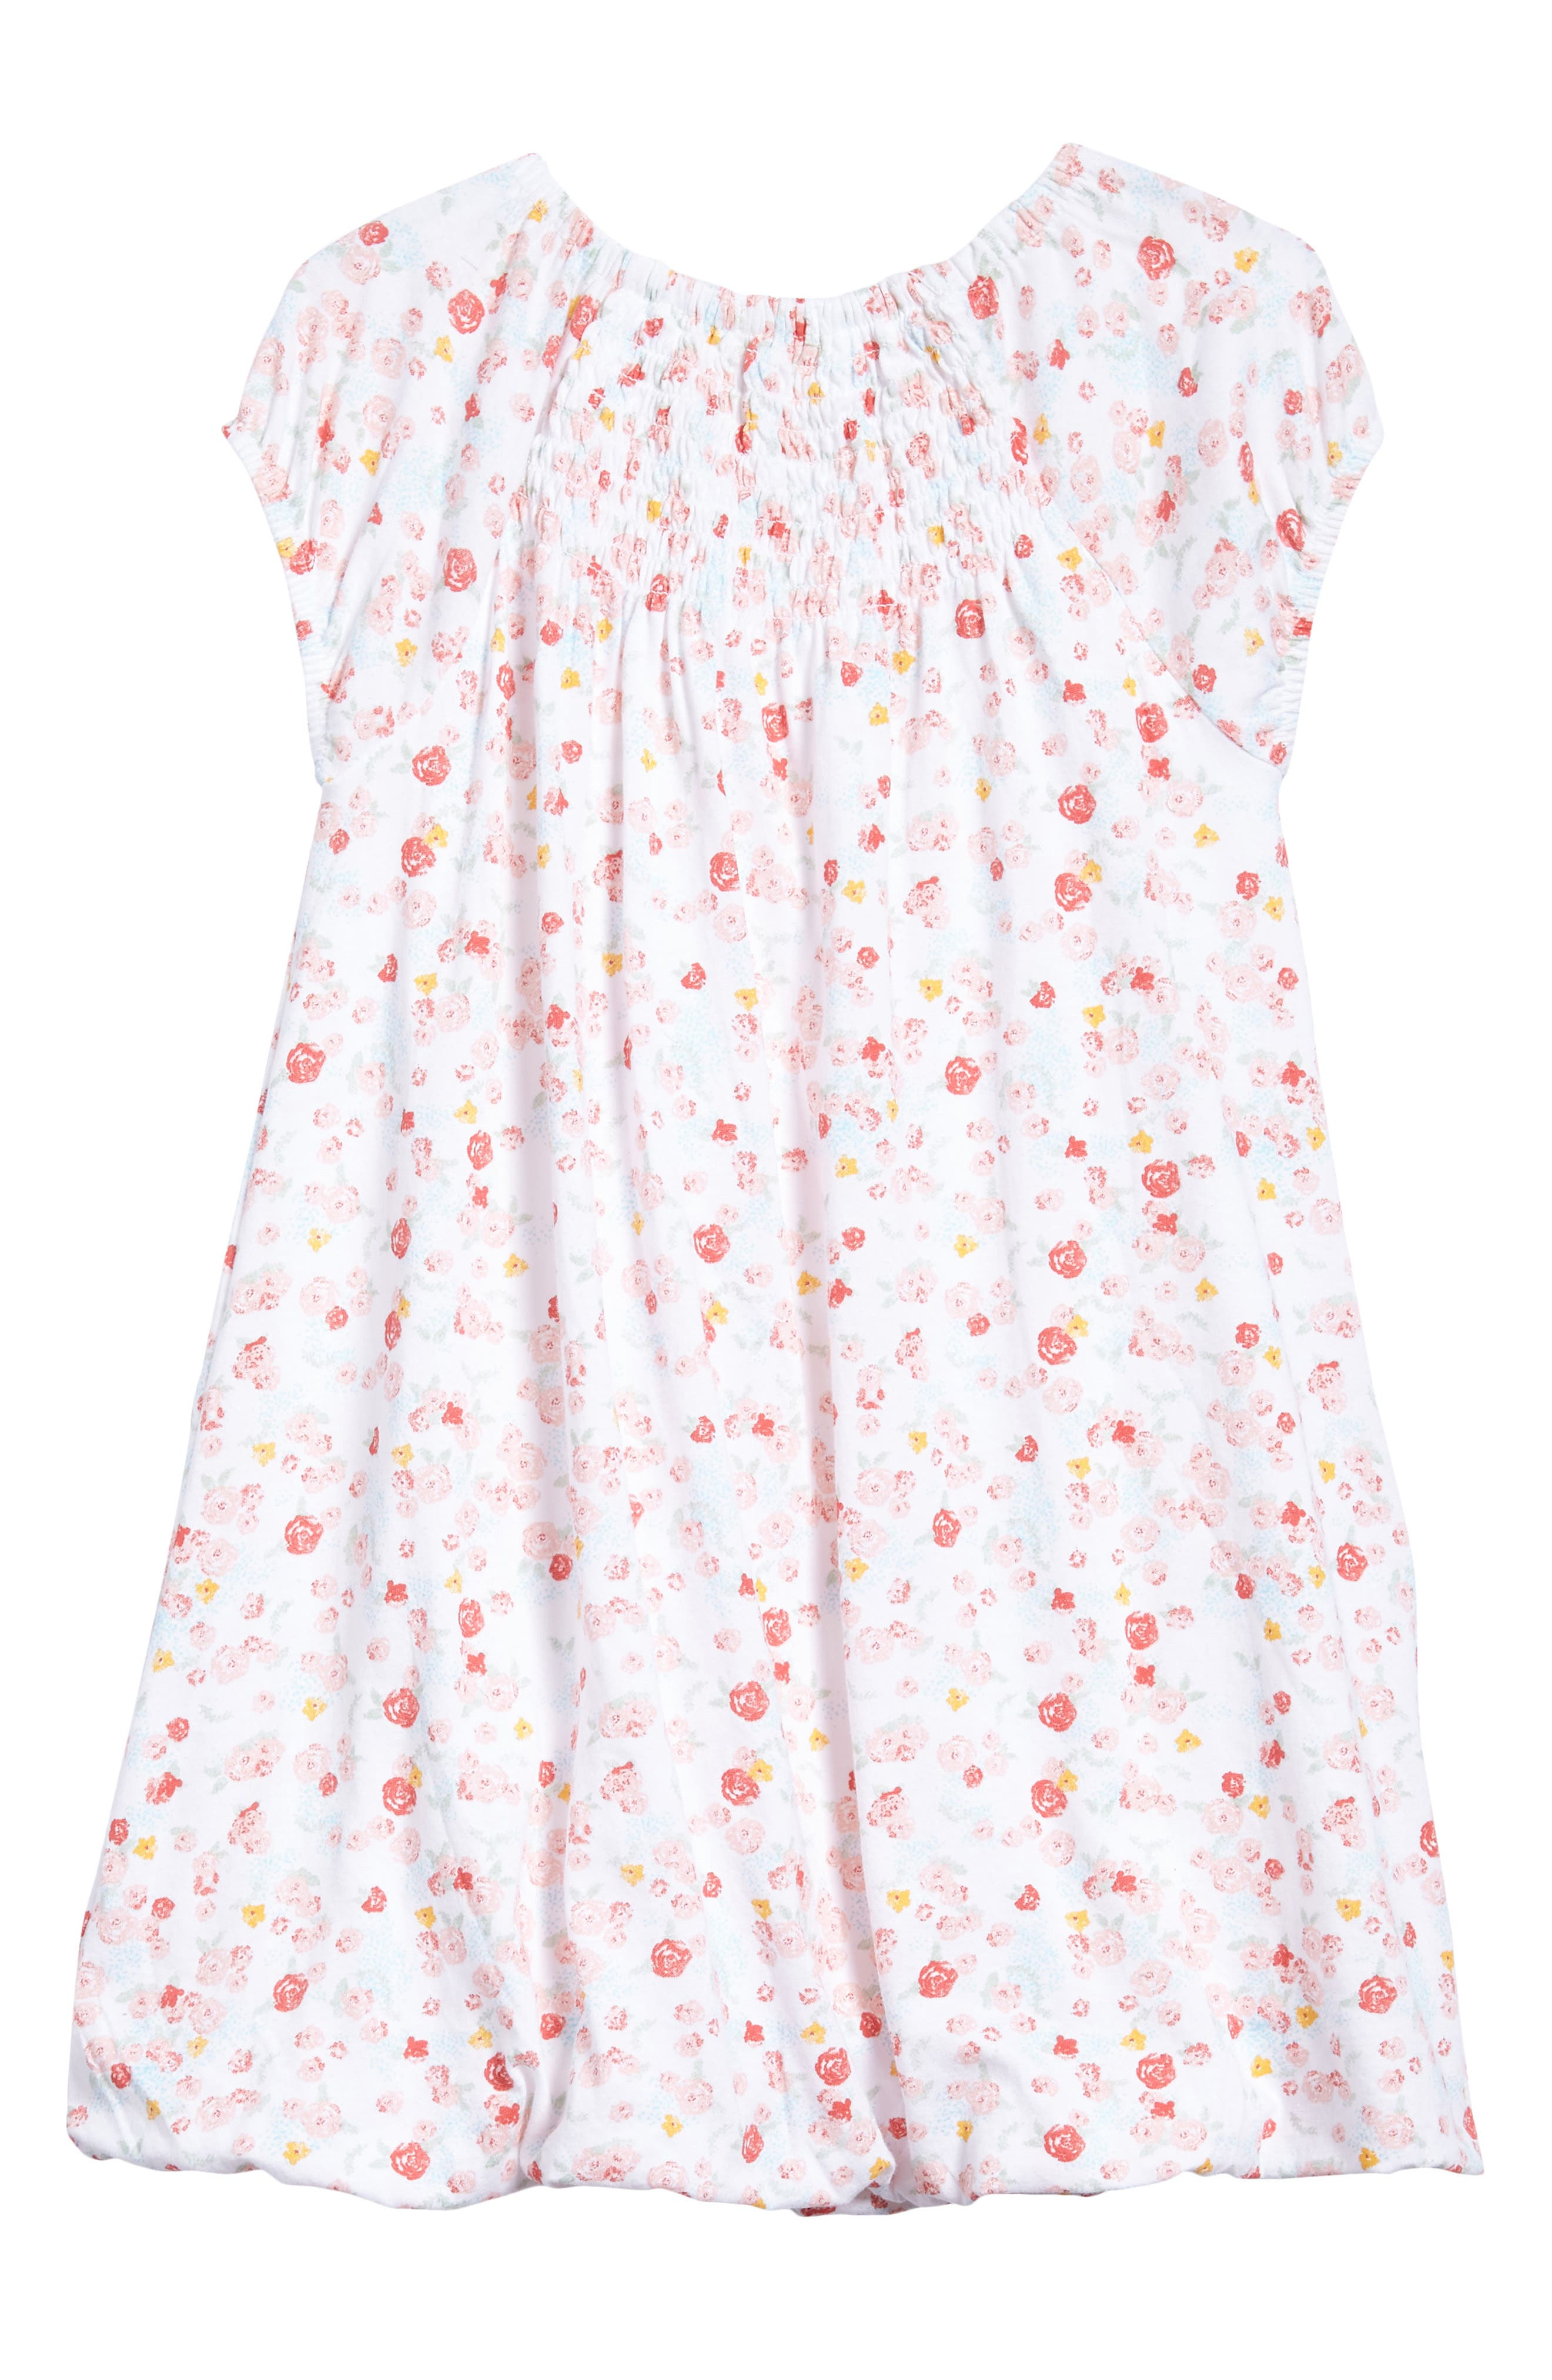 Ditsy Floral Print Bubble Dress,                             Alternate thumbnail 2, color,                             100